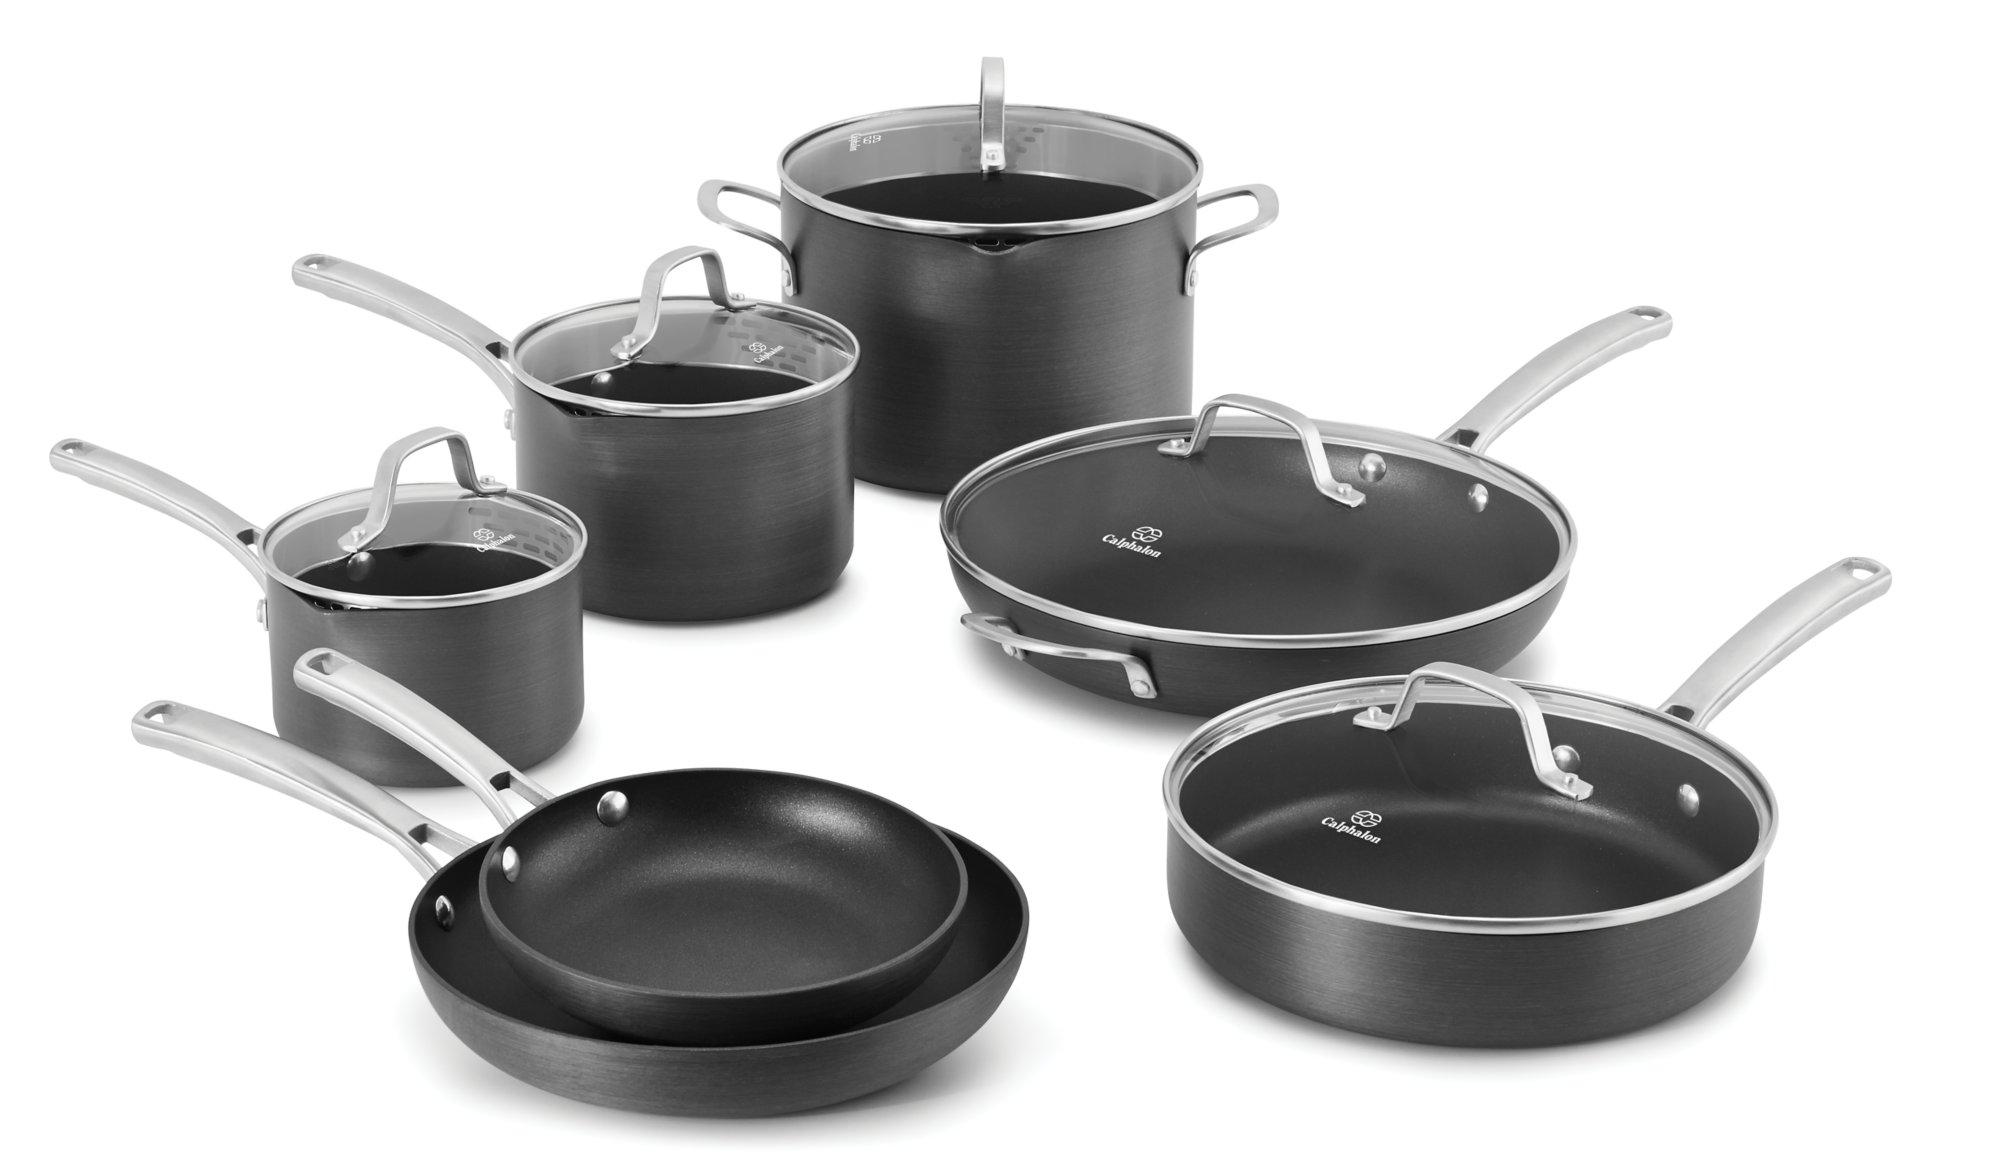 calphalon classic™ nonstick 12-pc. cookware set